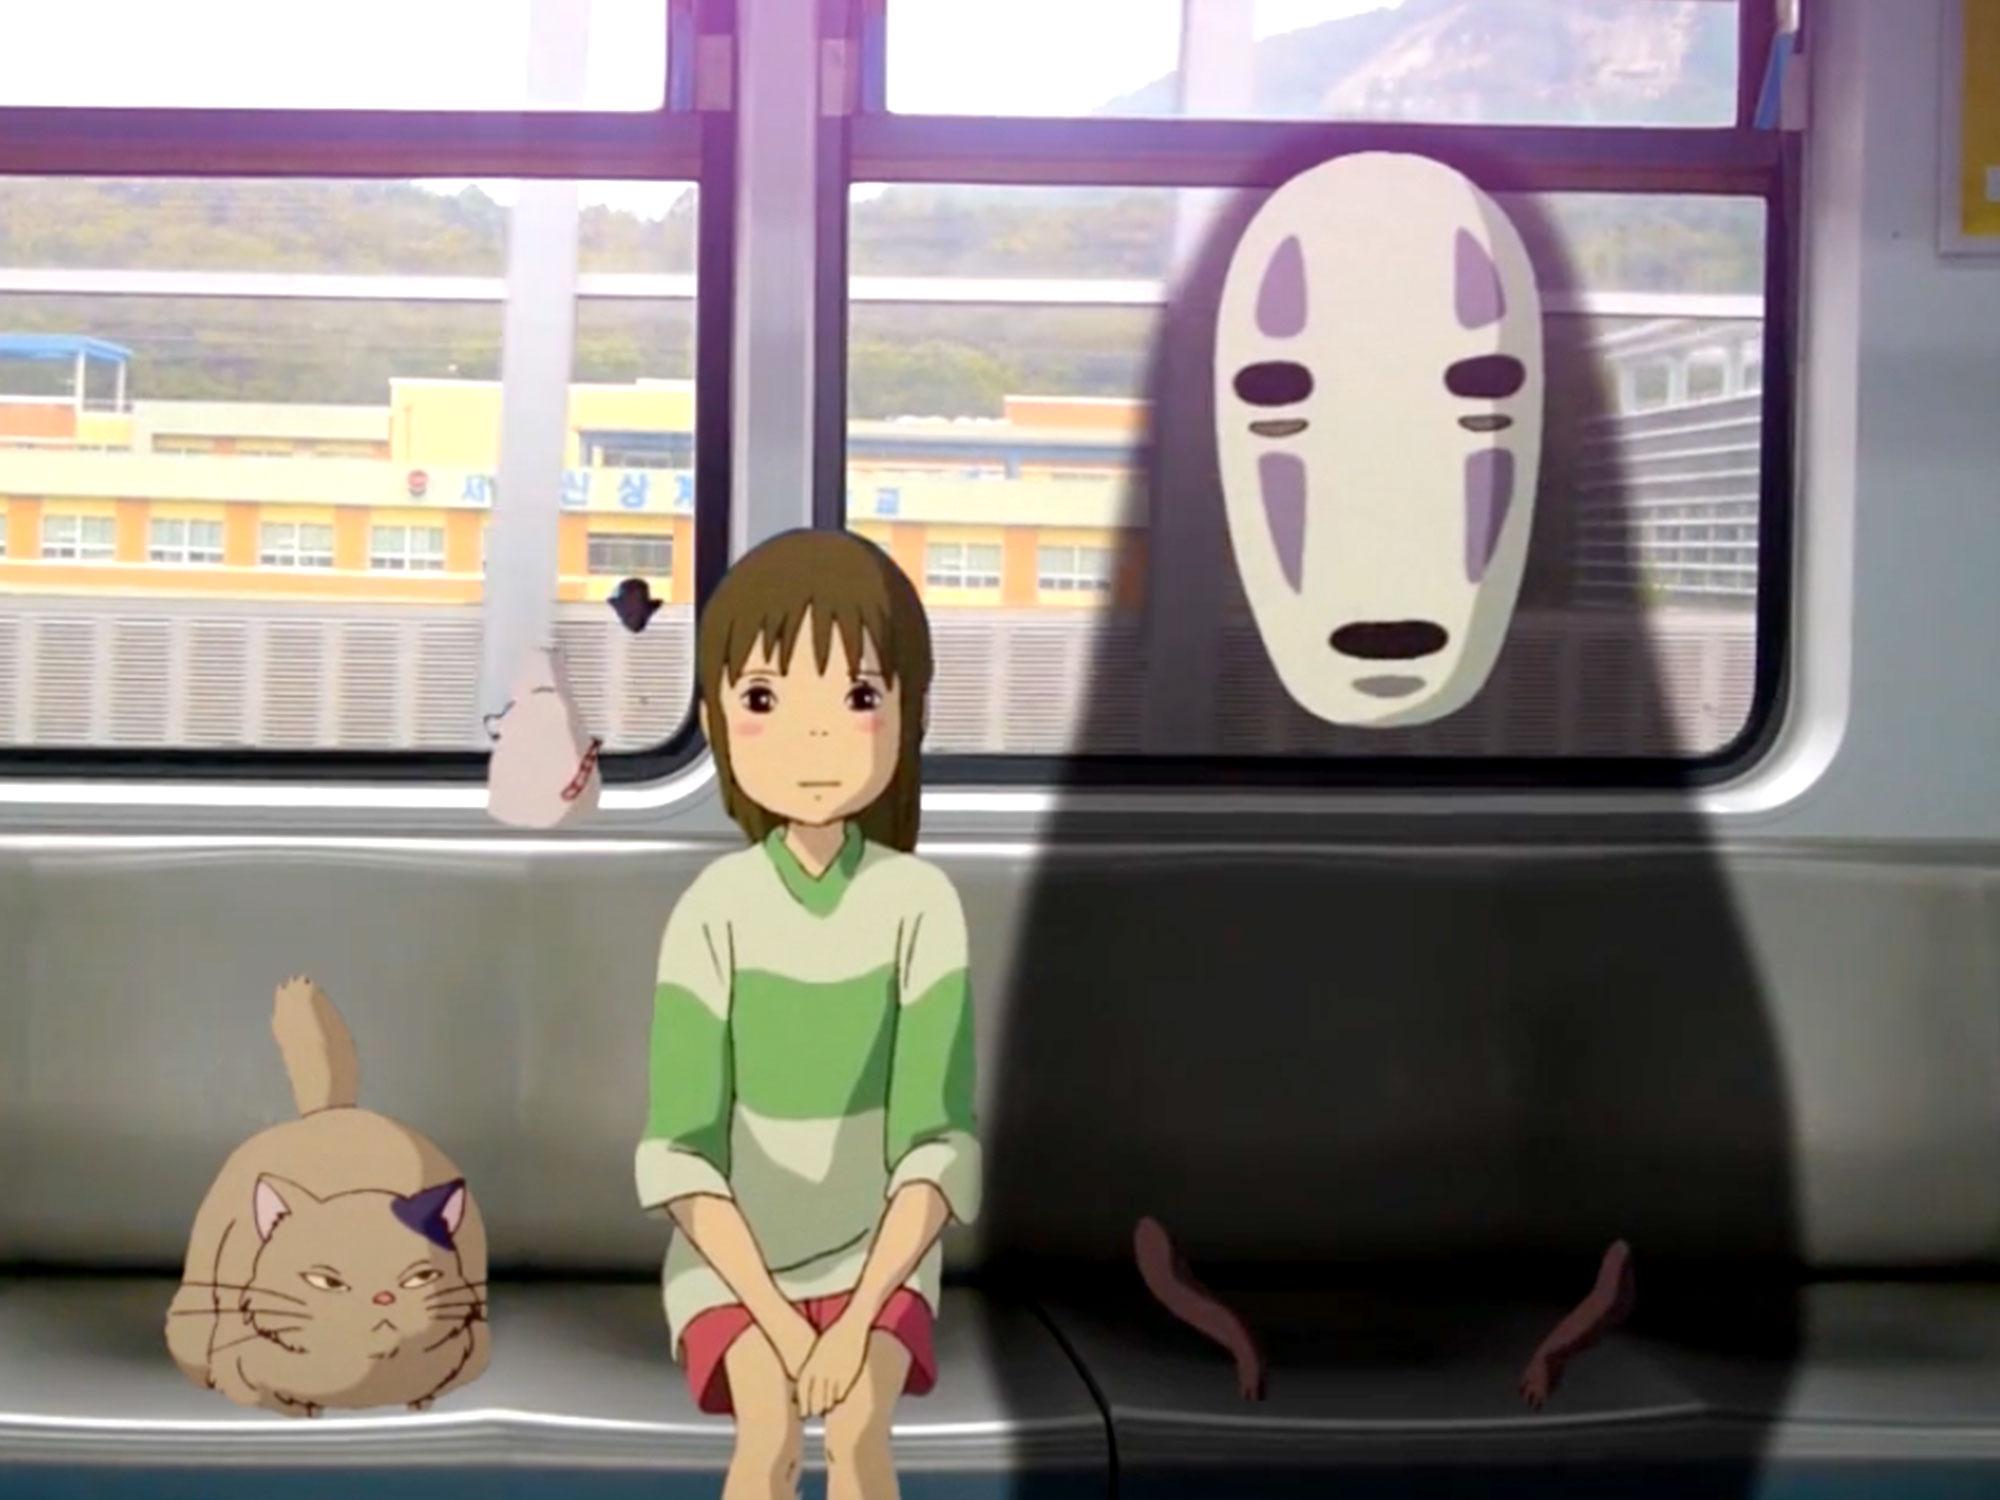 Studio Ghibli in real life